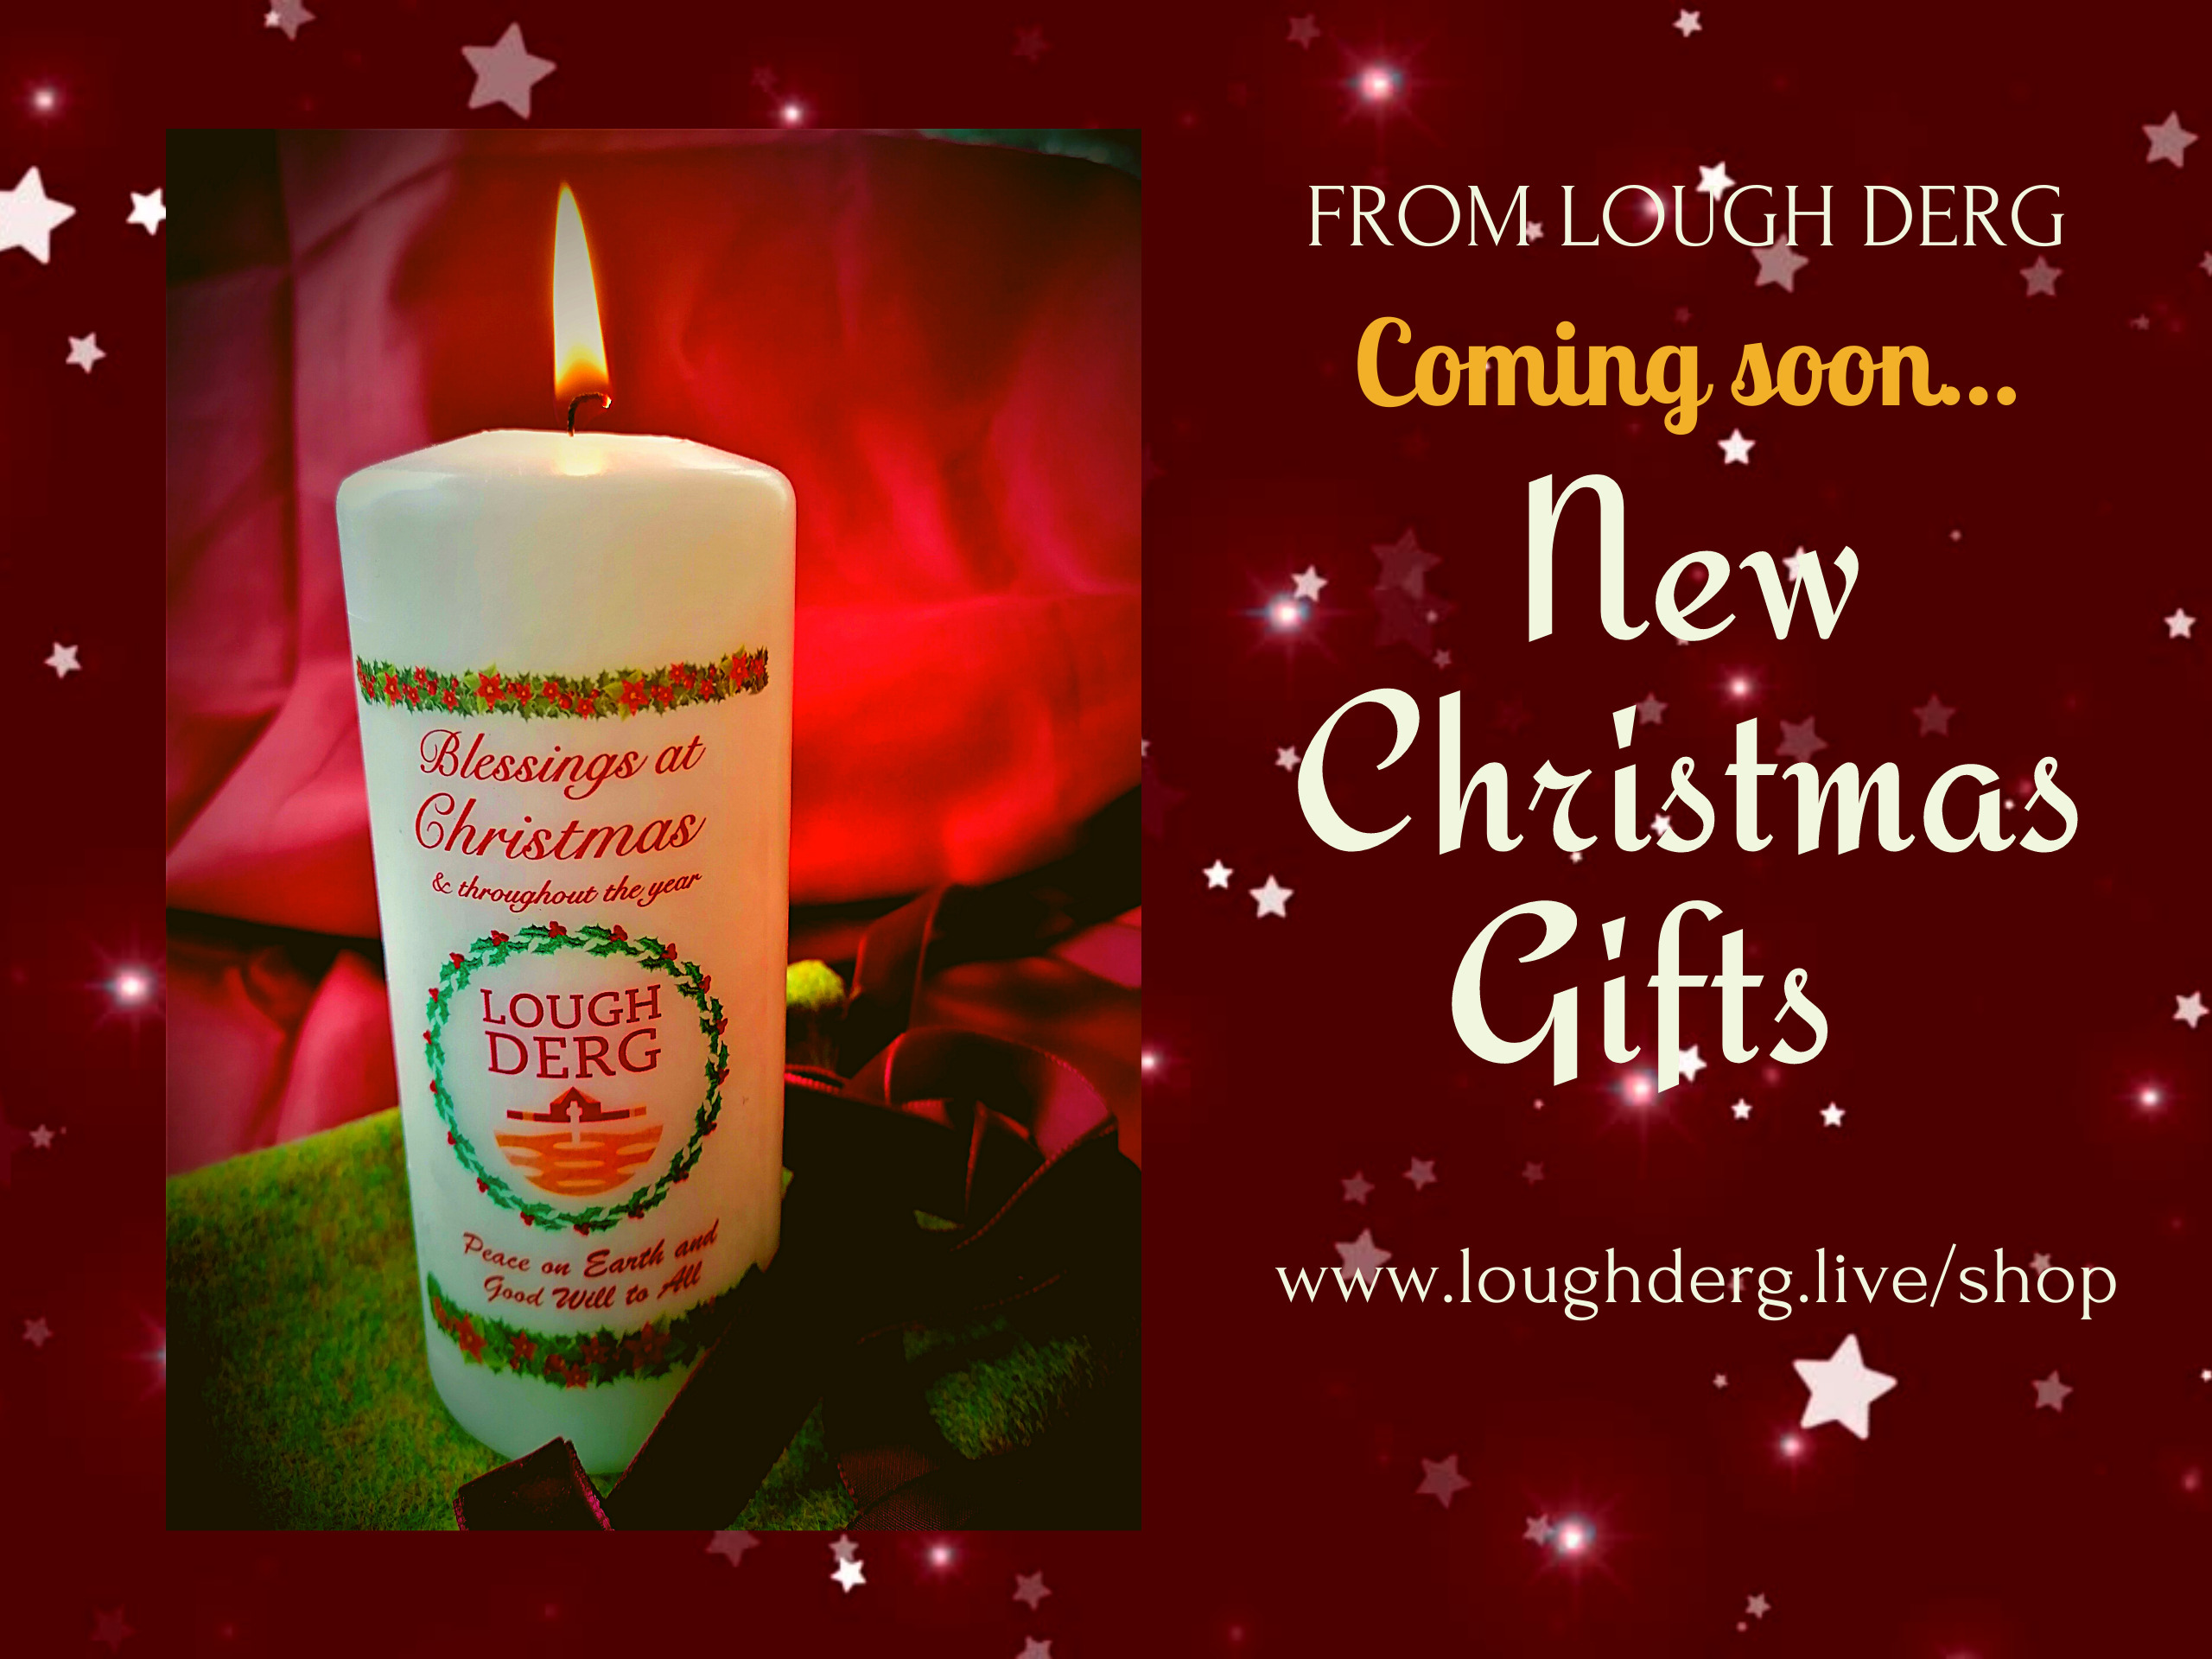 Lough Derg Christmas online gift shop